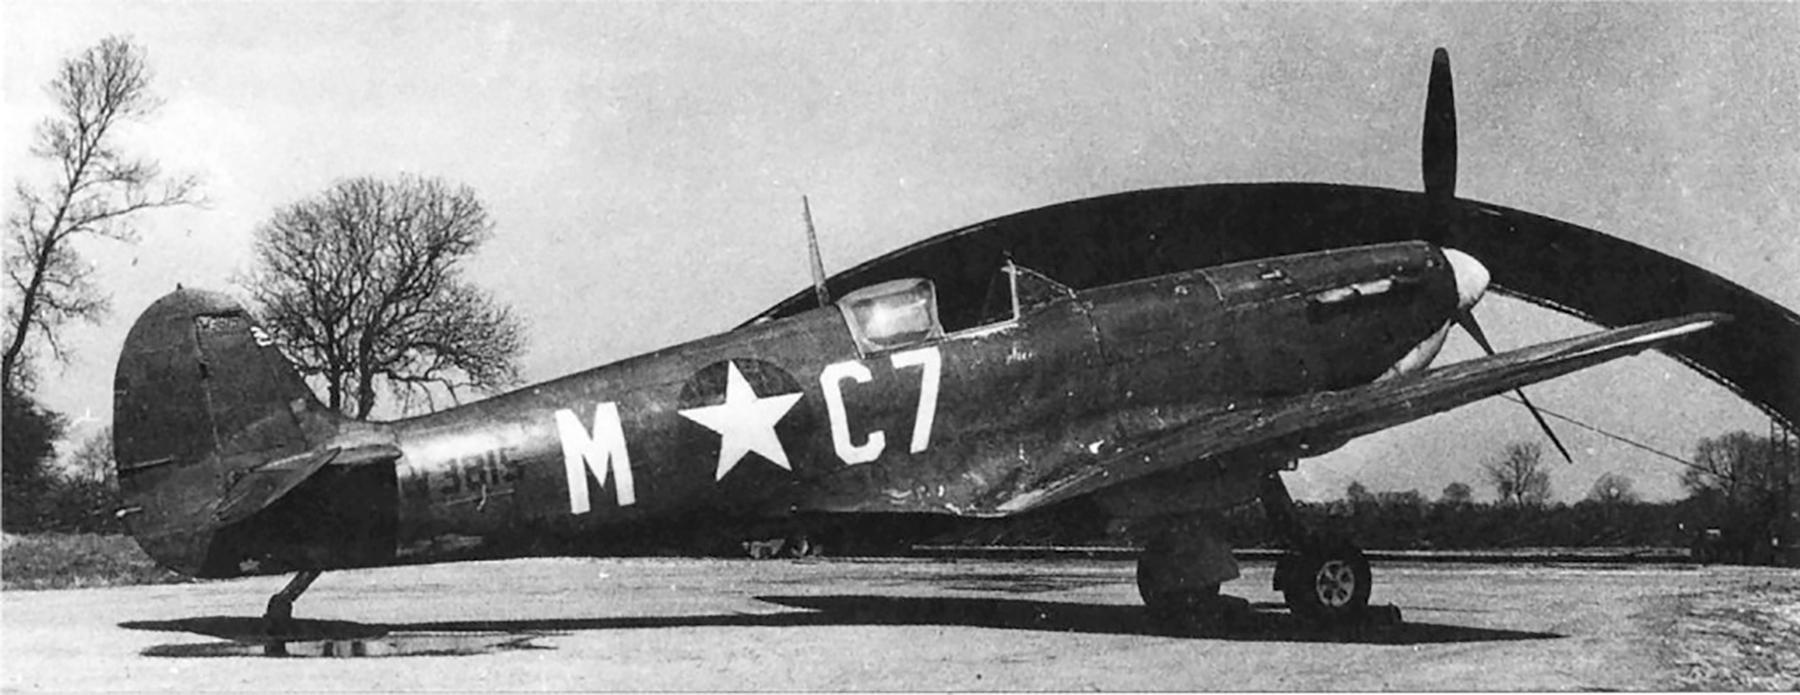 Spitfire LFVa USAAF 496FTG555FTS MC7 W3815 Goxhill England 01